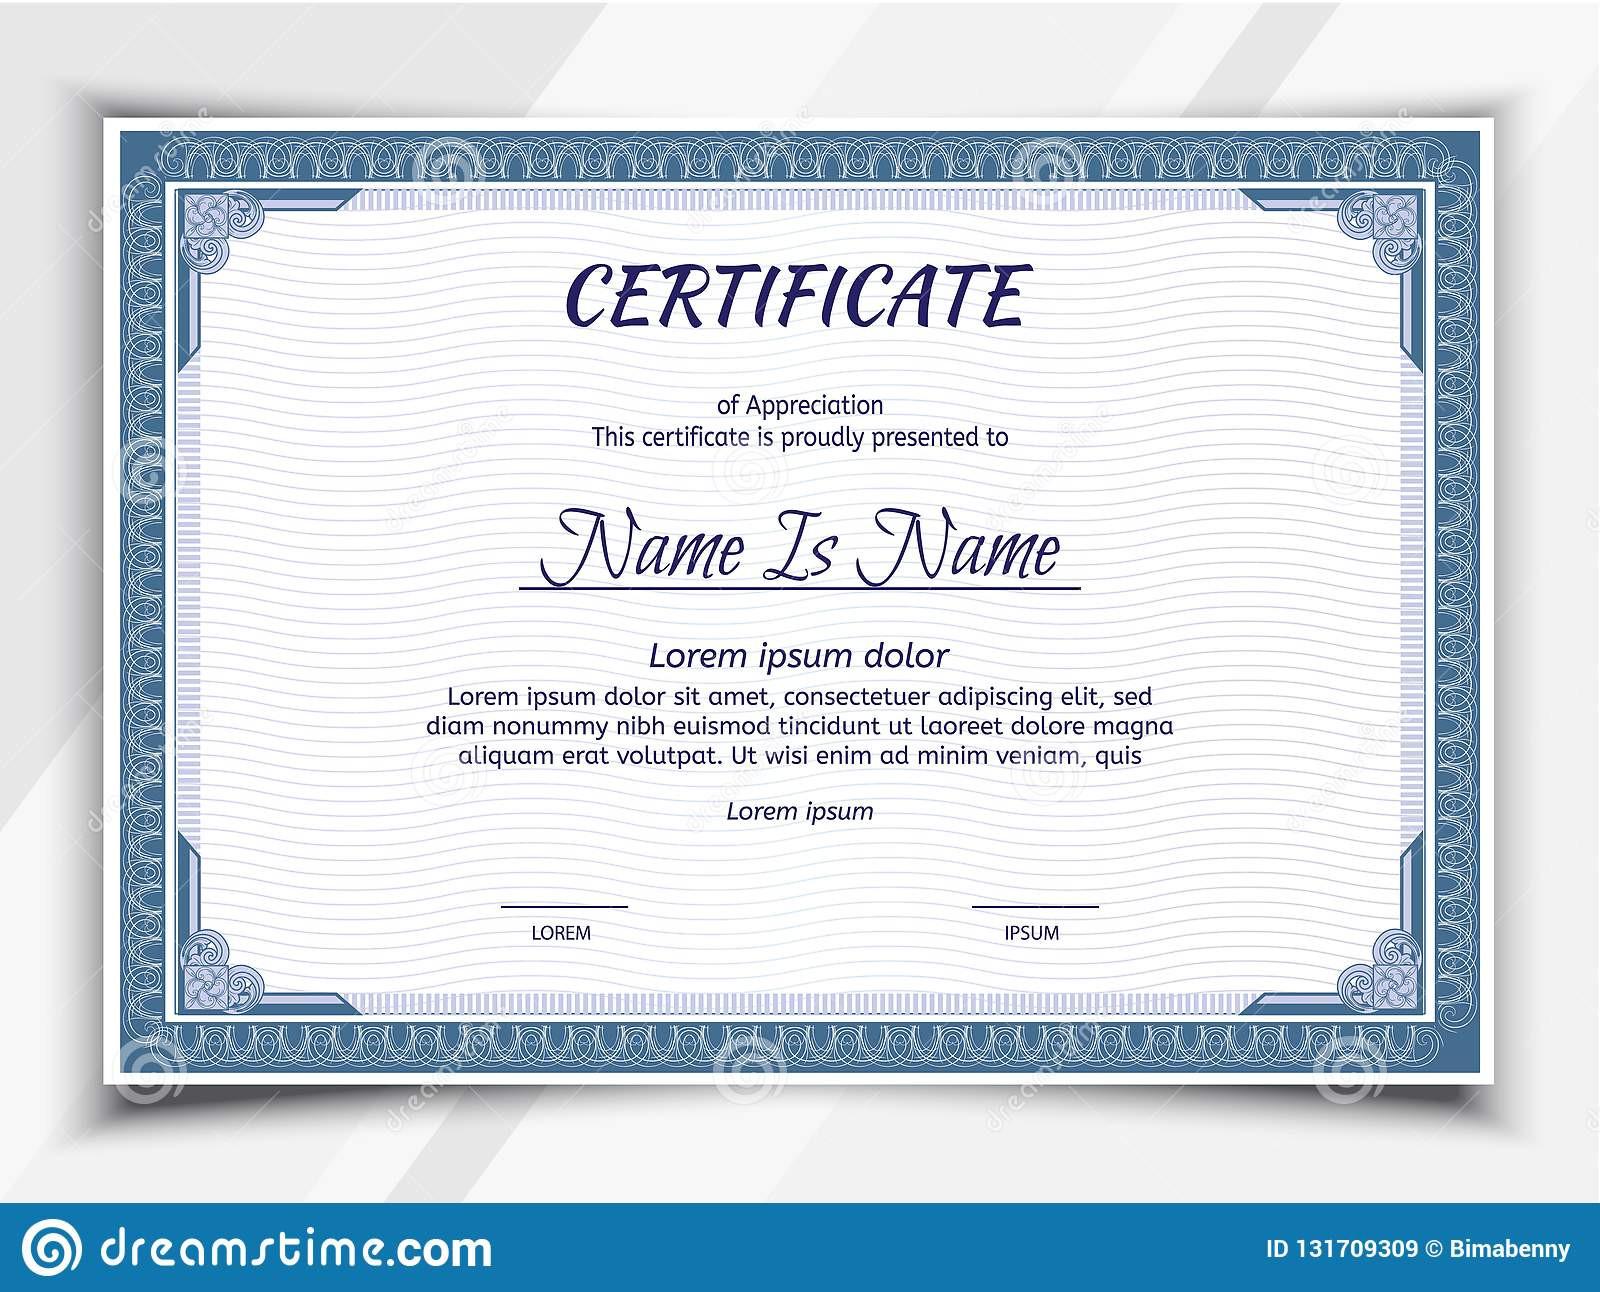 Landscape Design Certification  Certificate Landscape Template Stock Vector Illustration